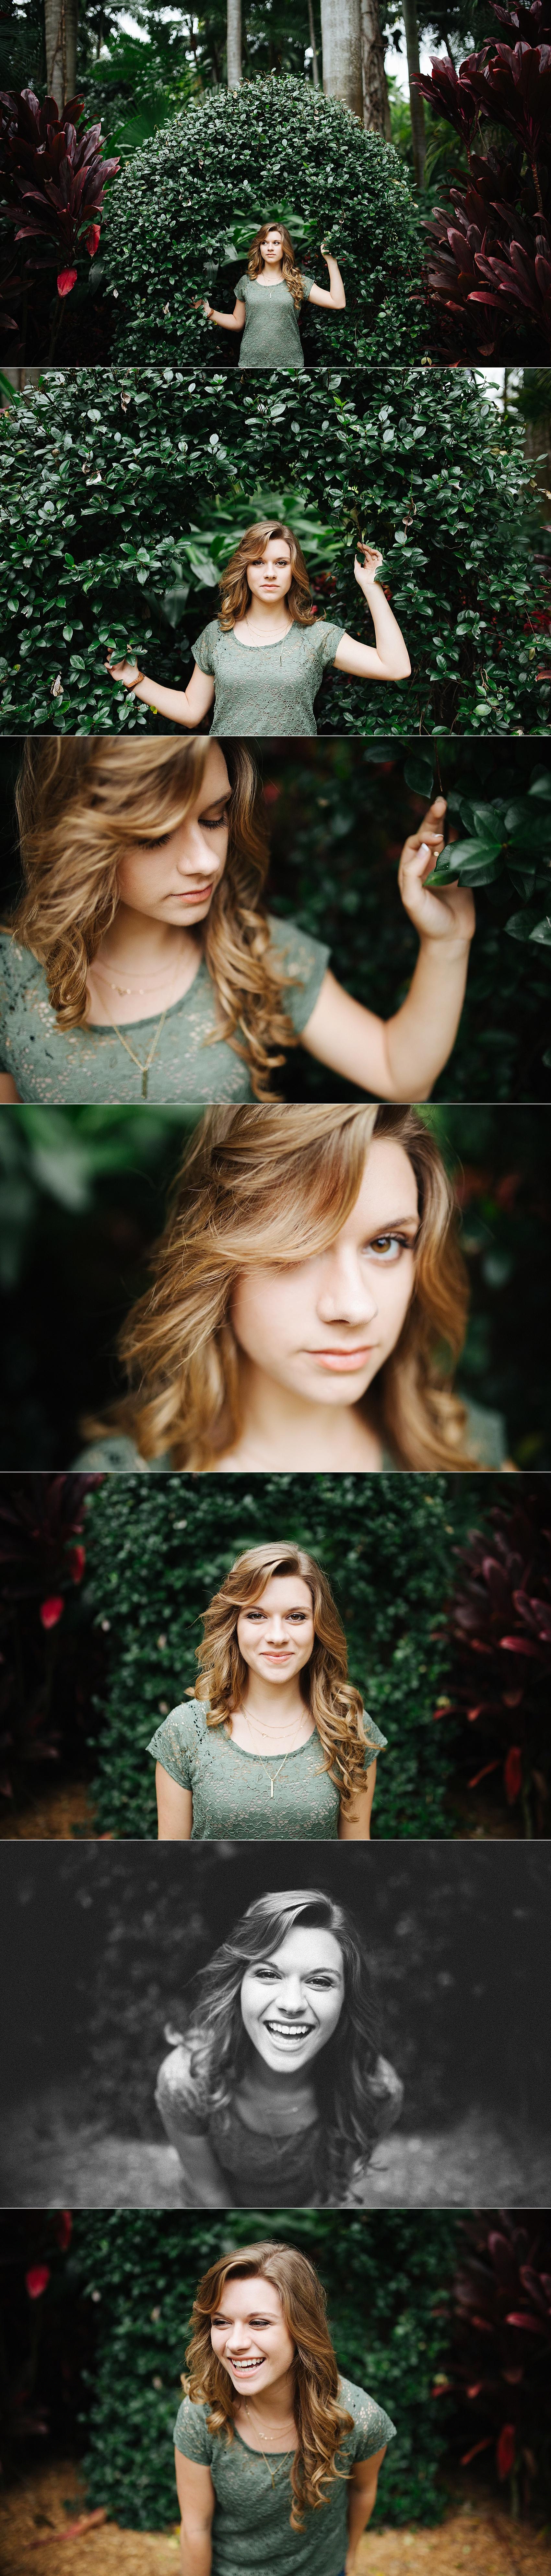 stpete senior portraits sunken gardens leah-4